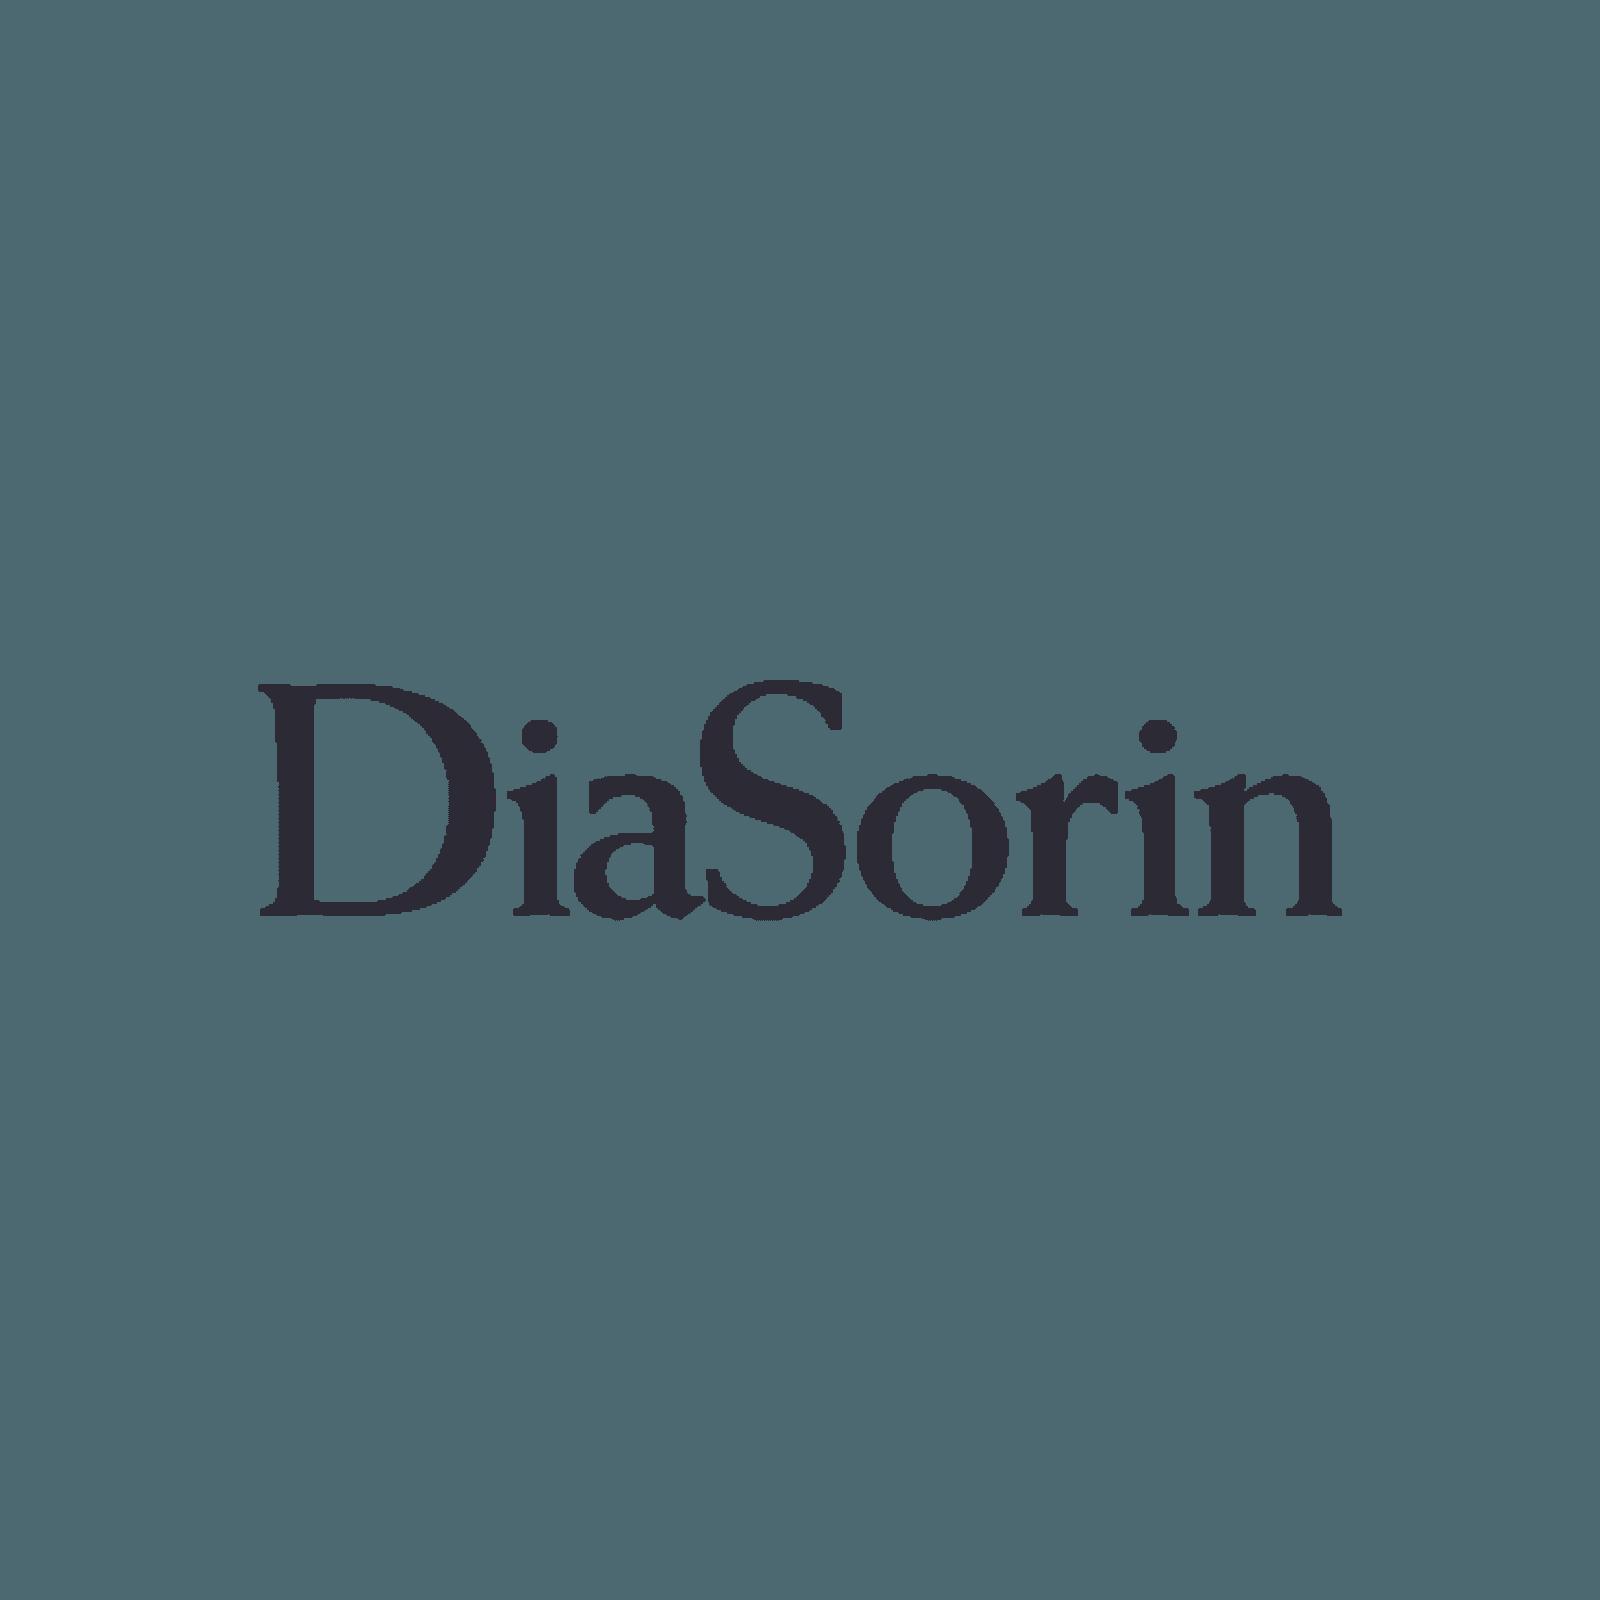 Diasorin brand